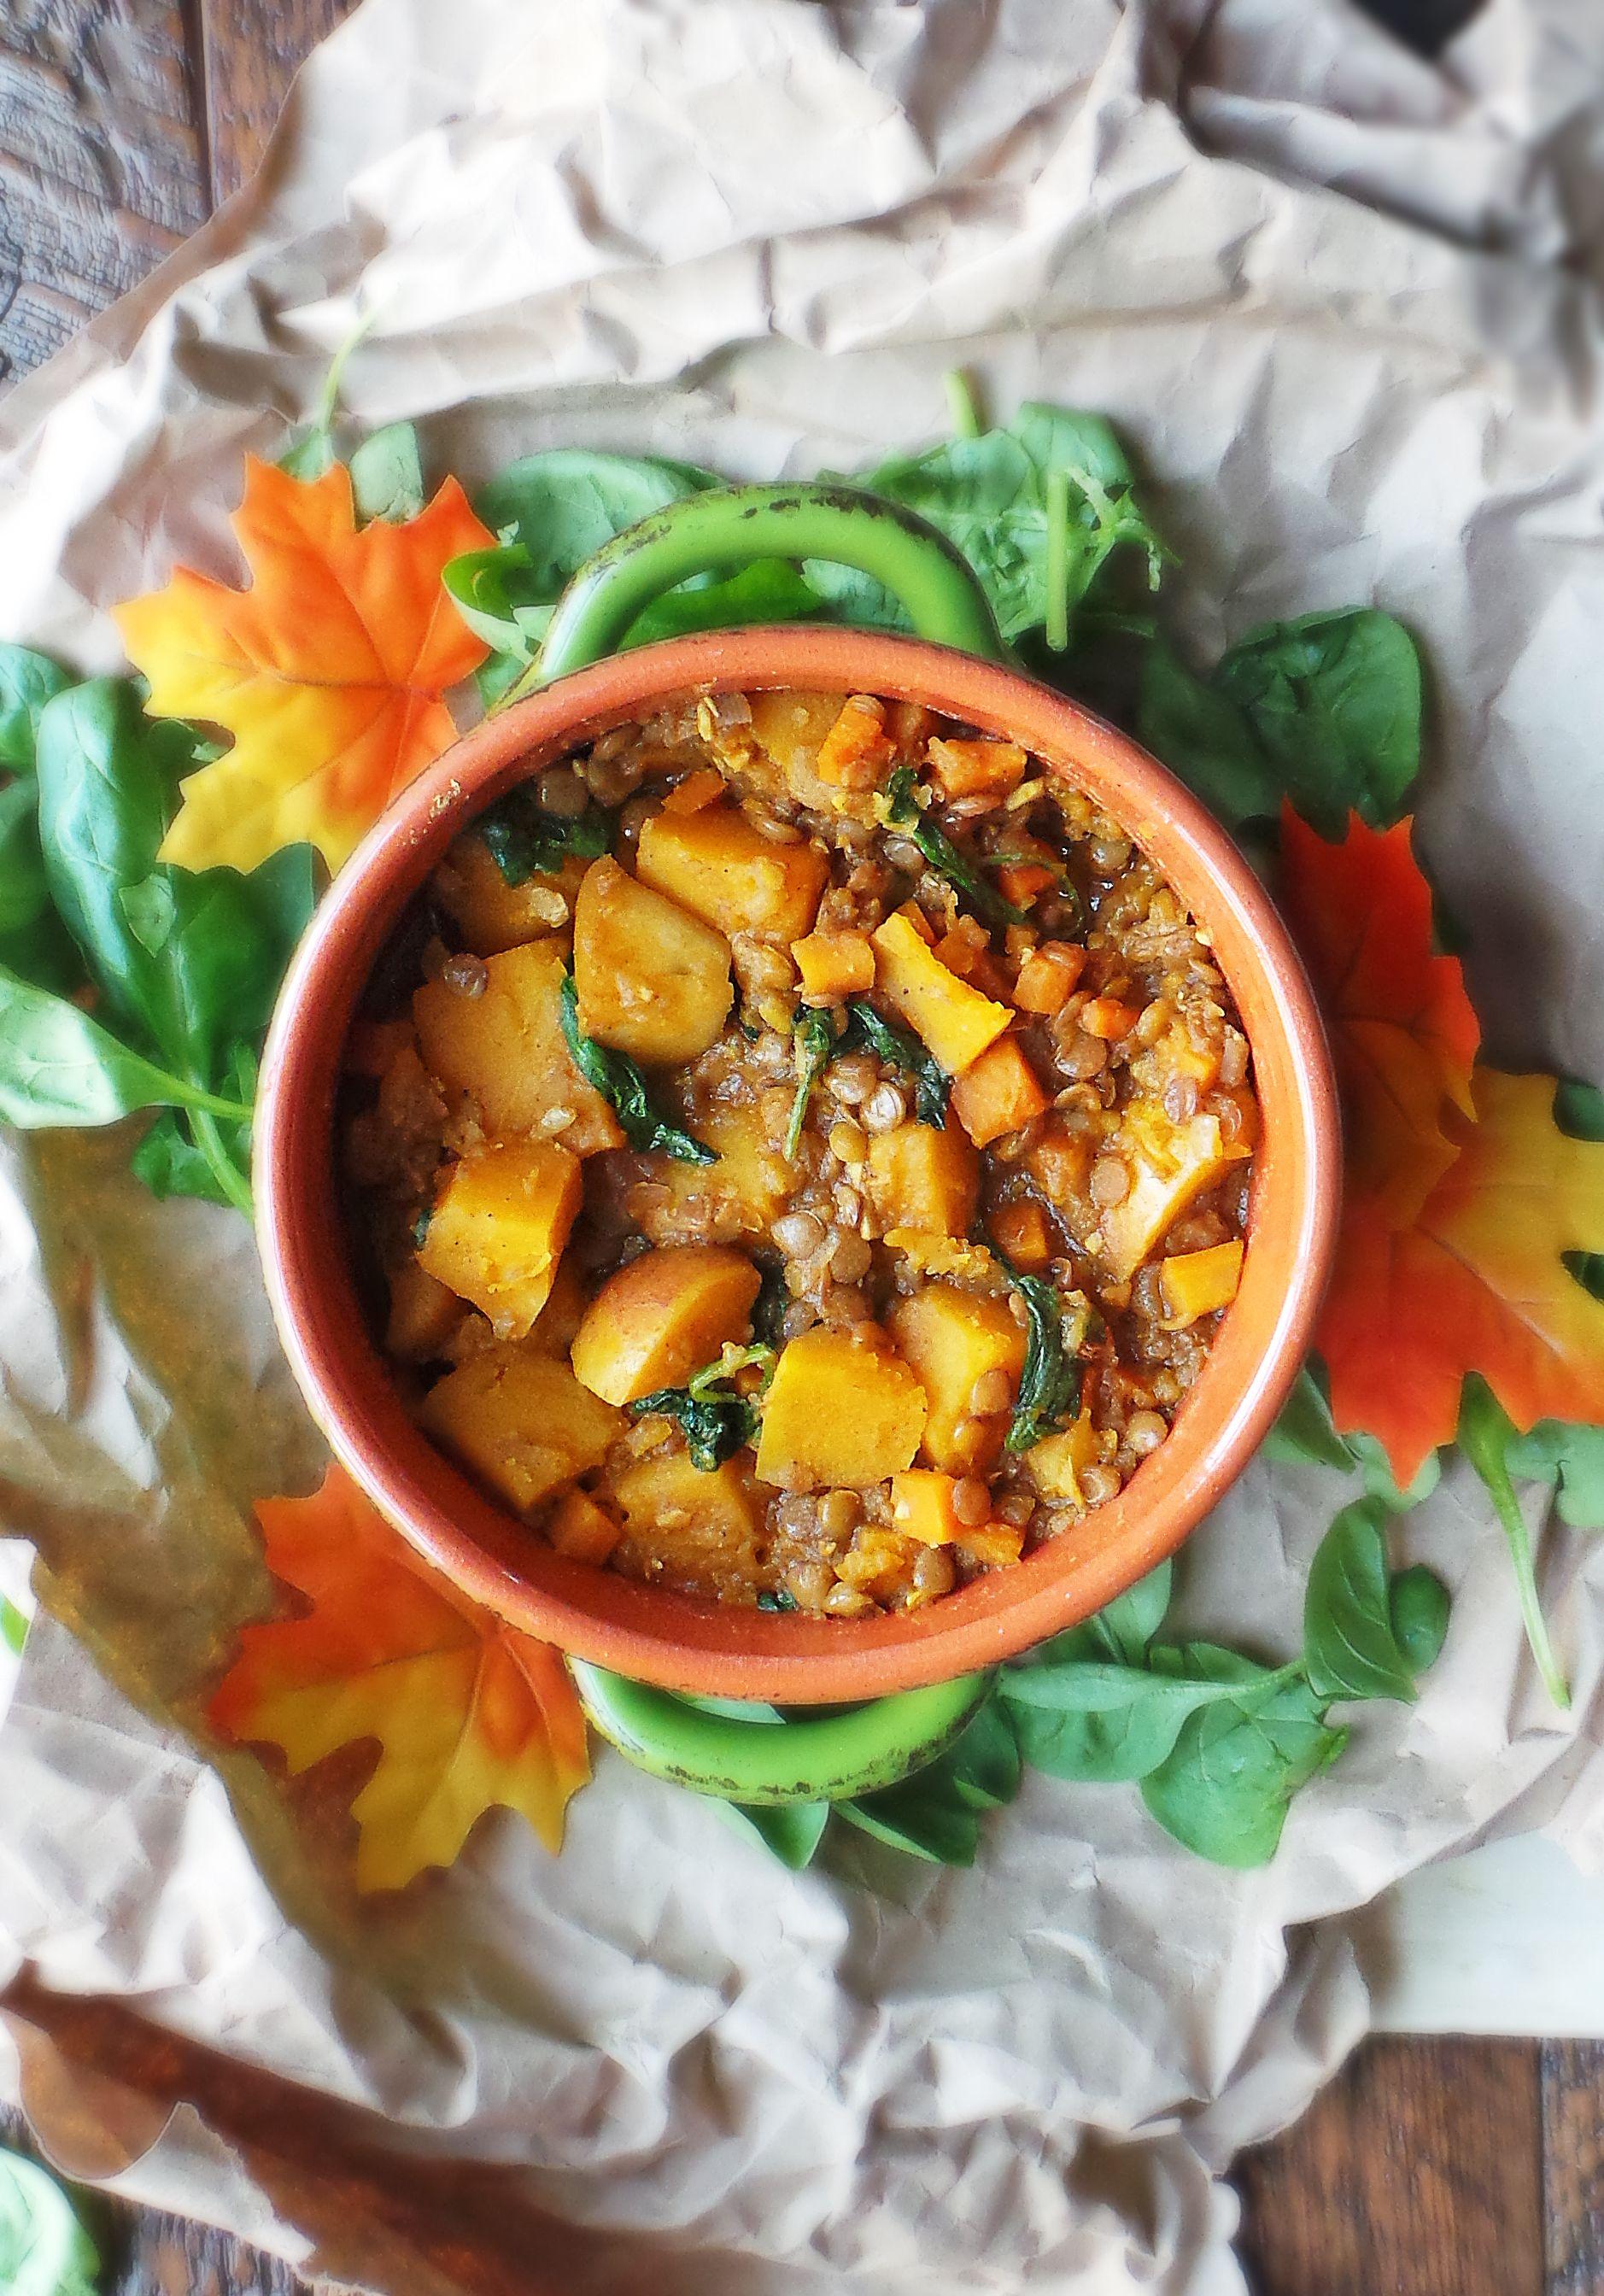 Curried Butternut Squash & Lentil Stew